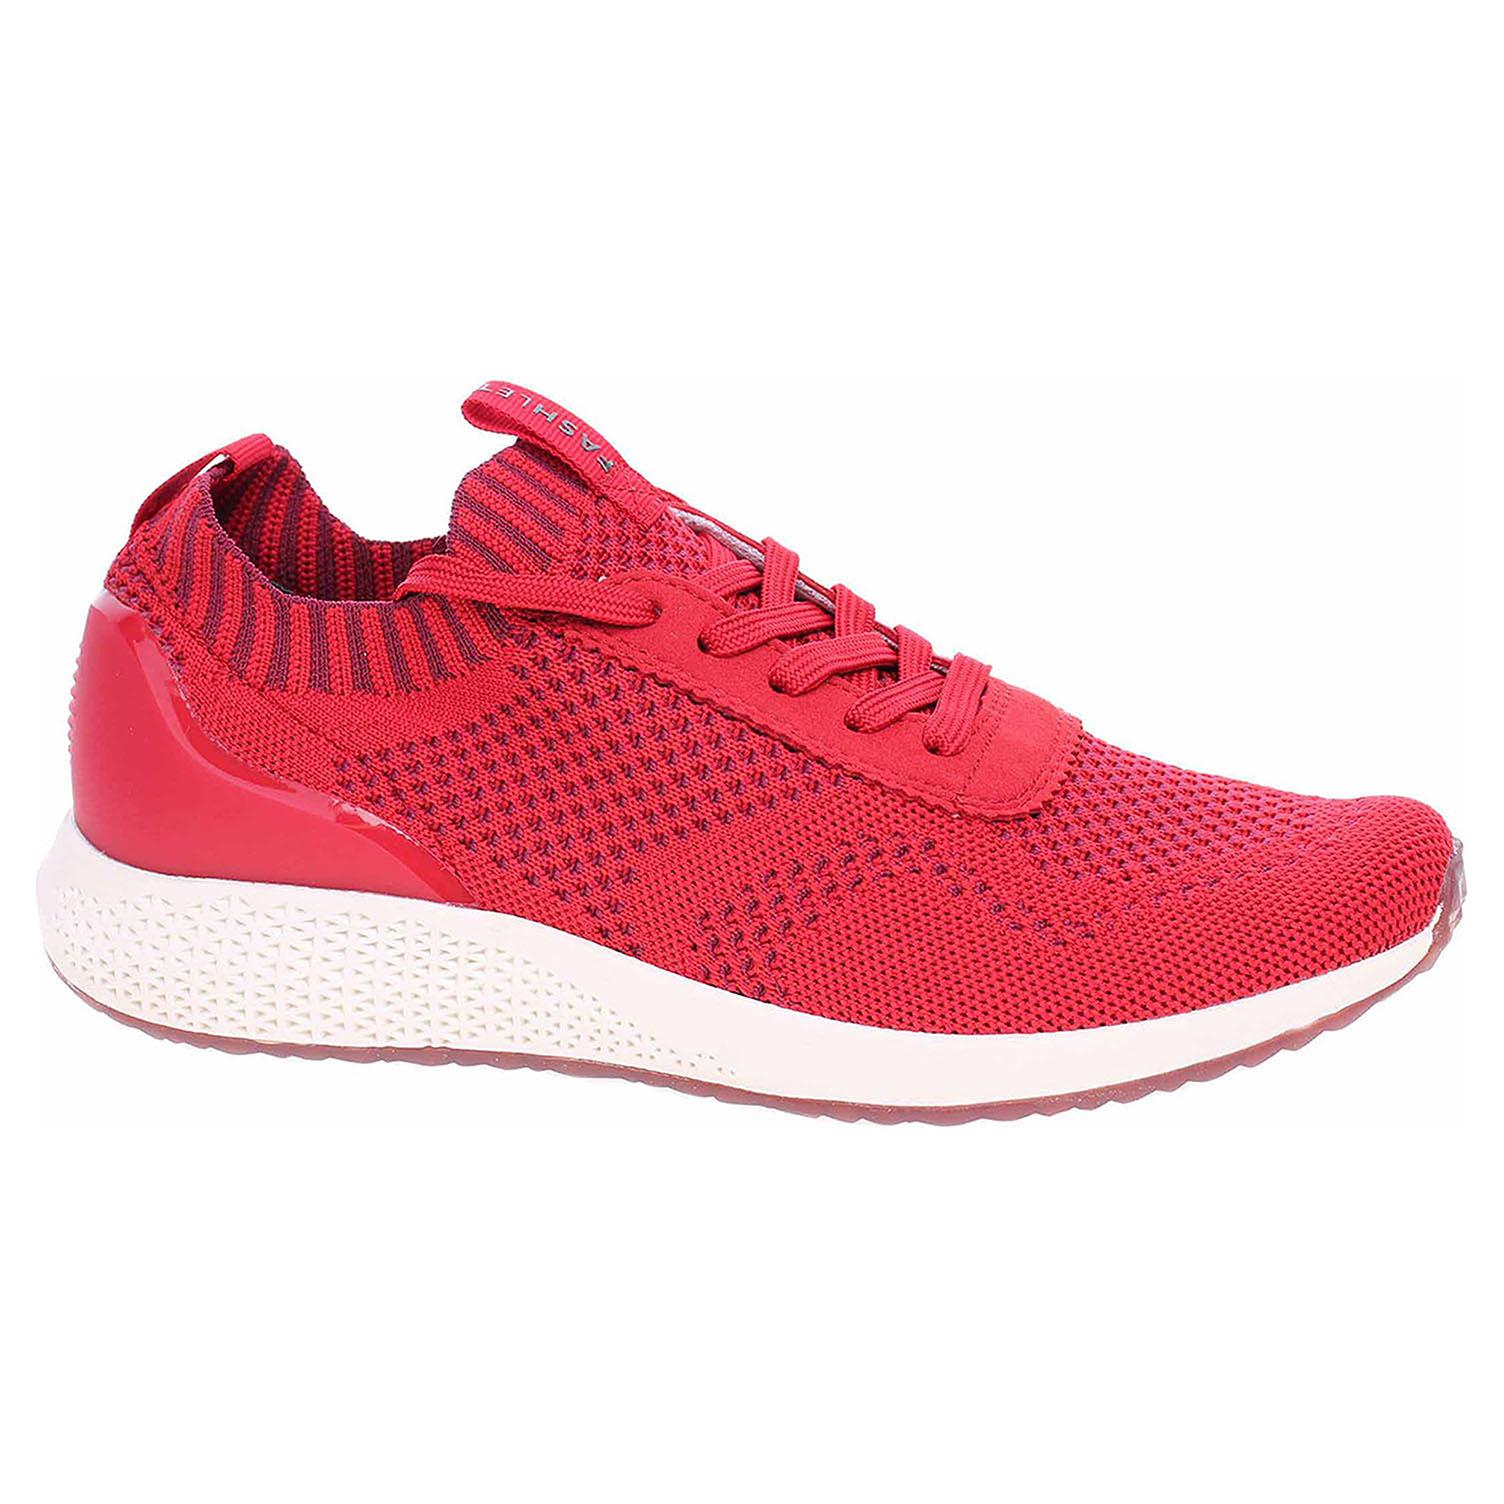 Dámská obuv Tamaris 1-23714-23 scarlet 1-1-23714-23 964 37